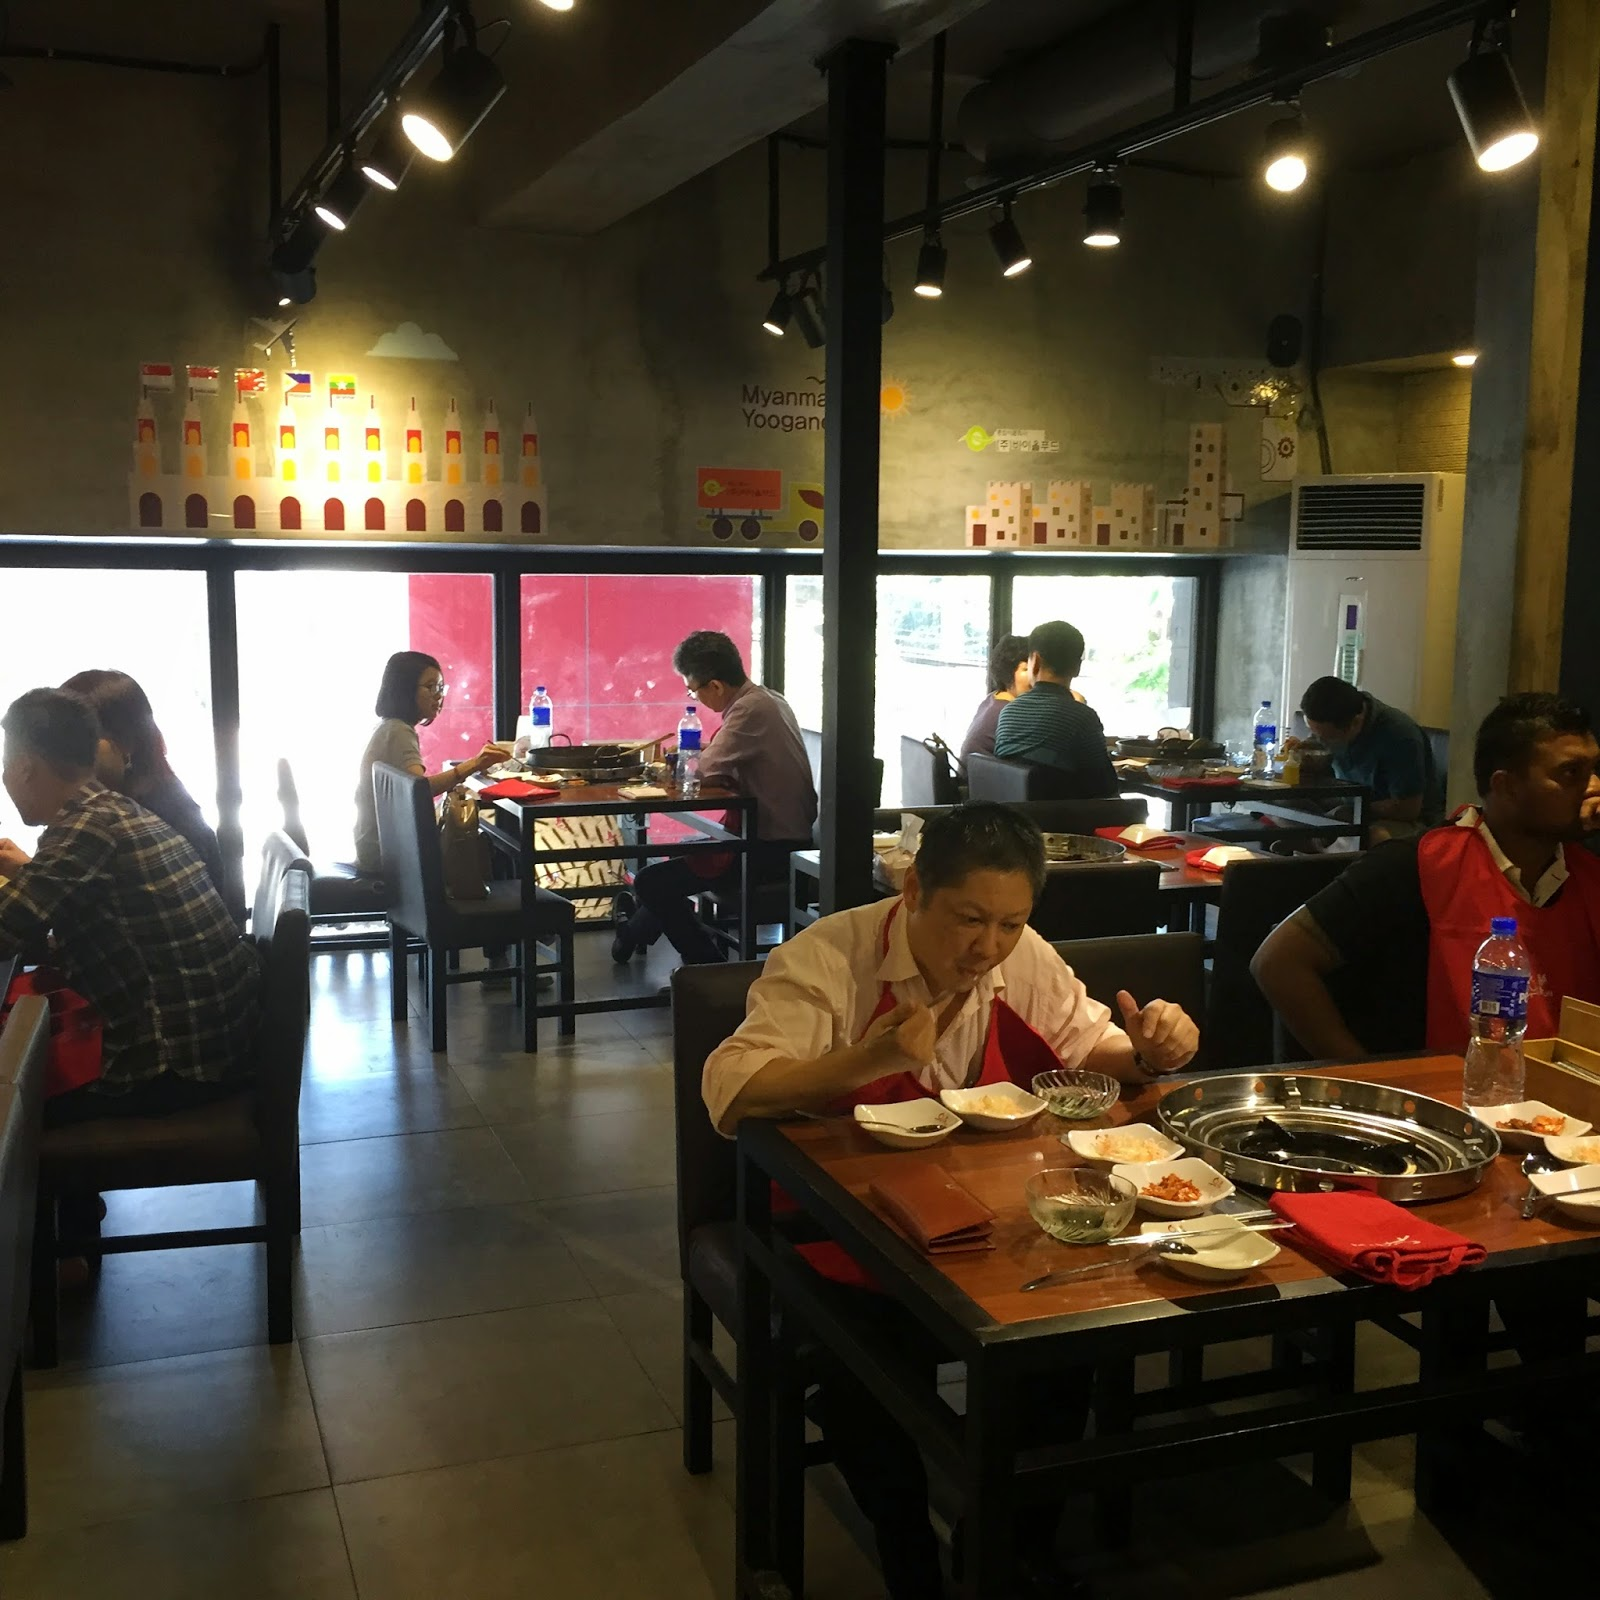 Doggyjames says yoogane korean restaurant yangon